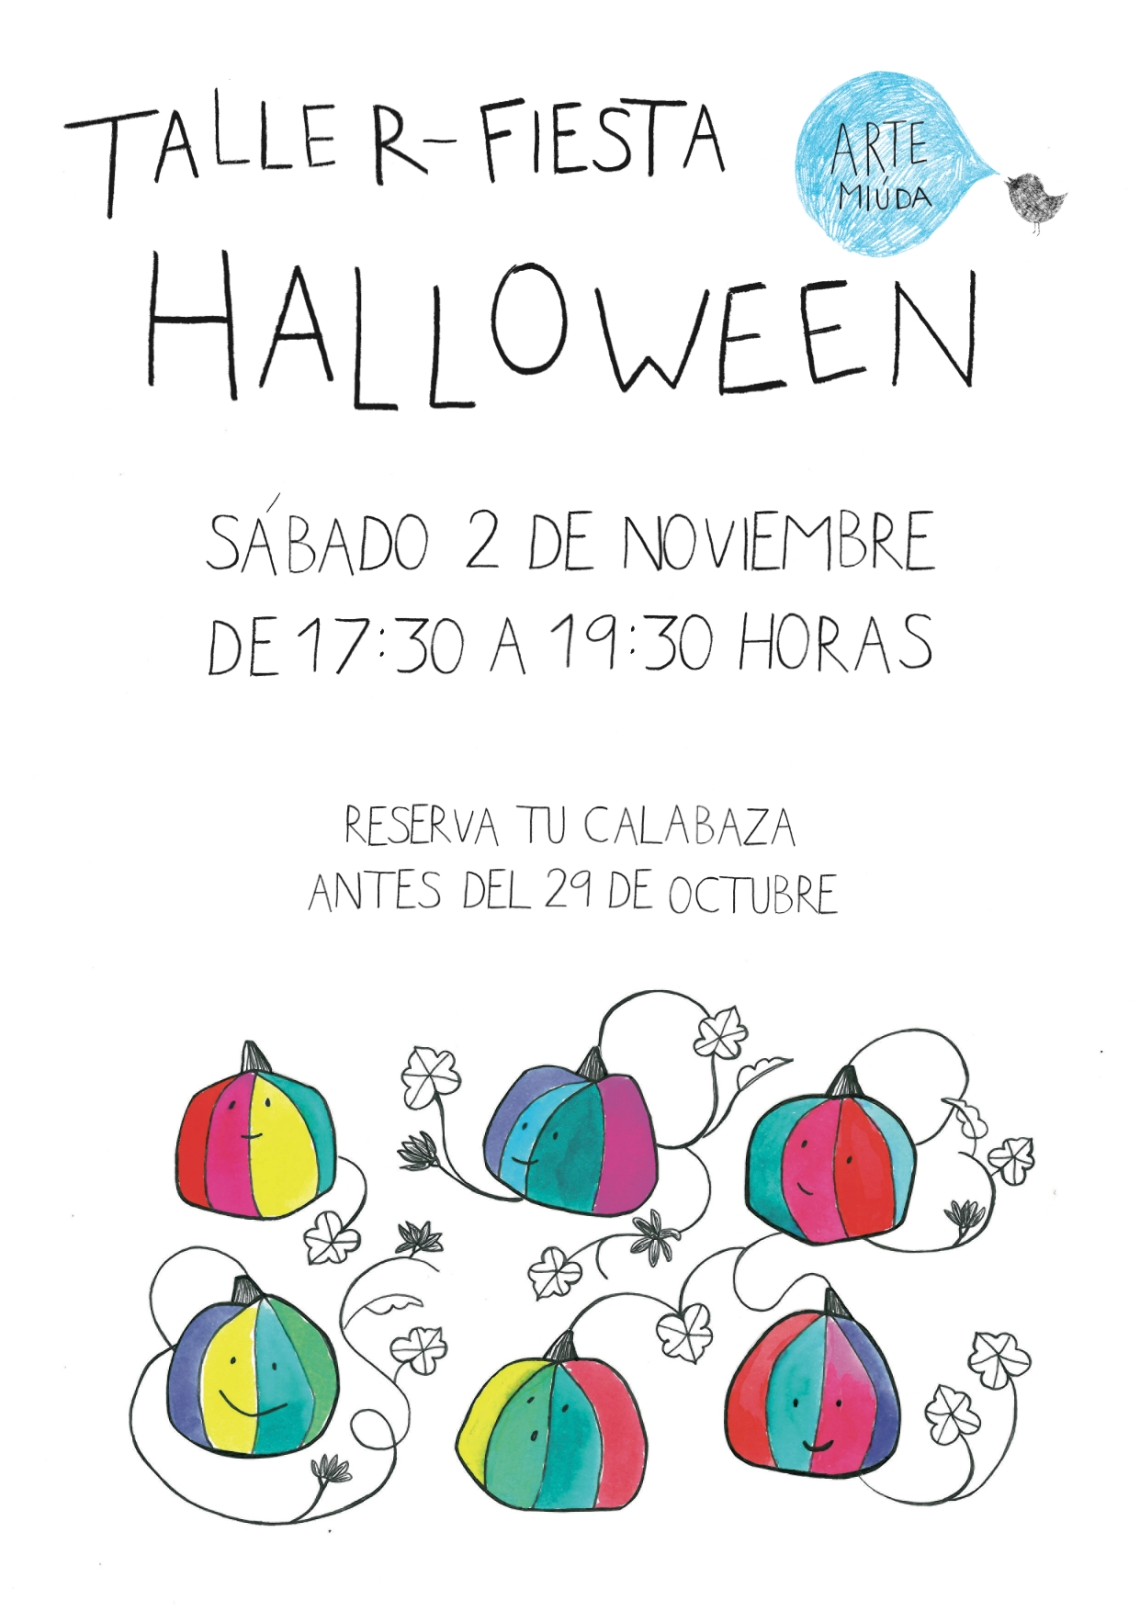 HALLOWEEN 2013 en Arte Miúda